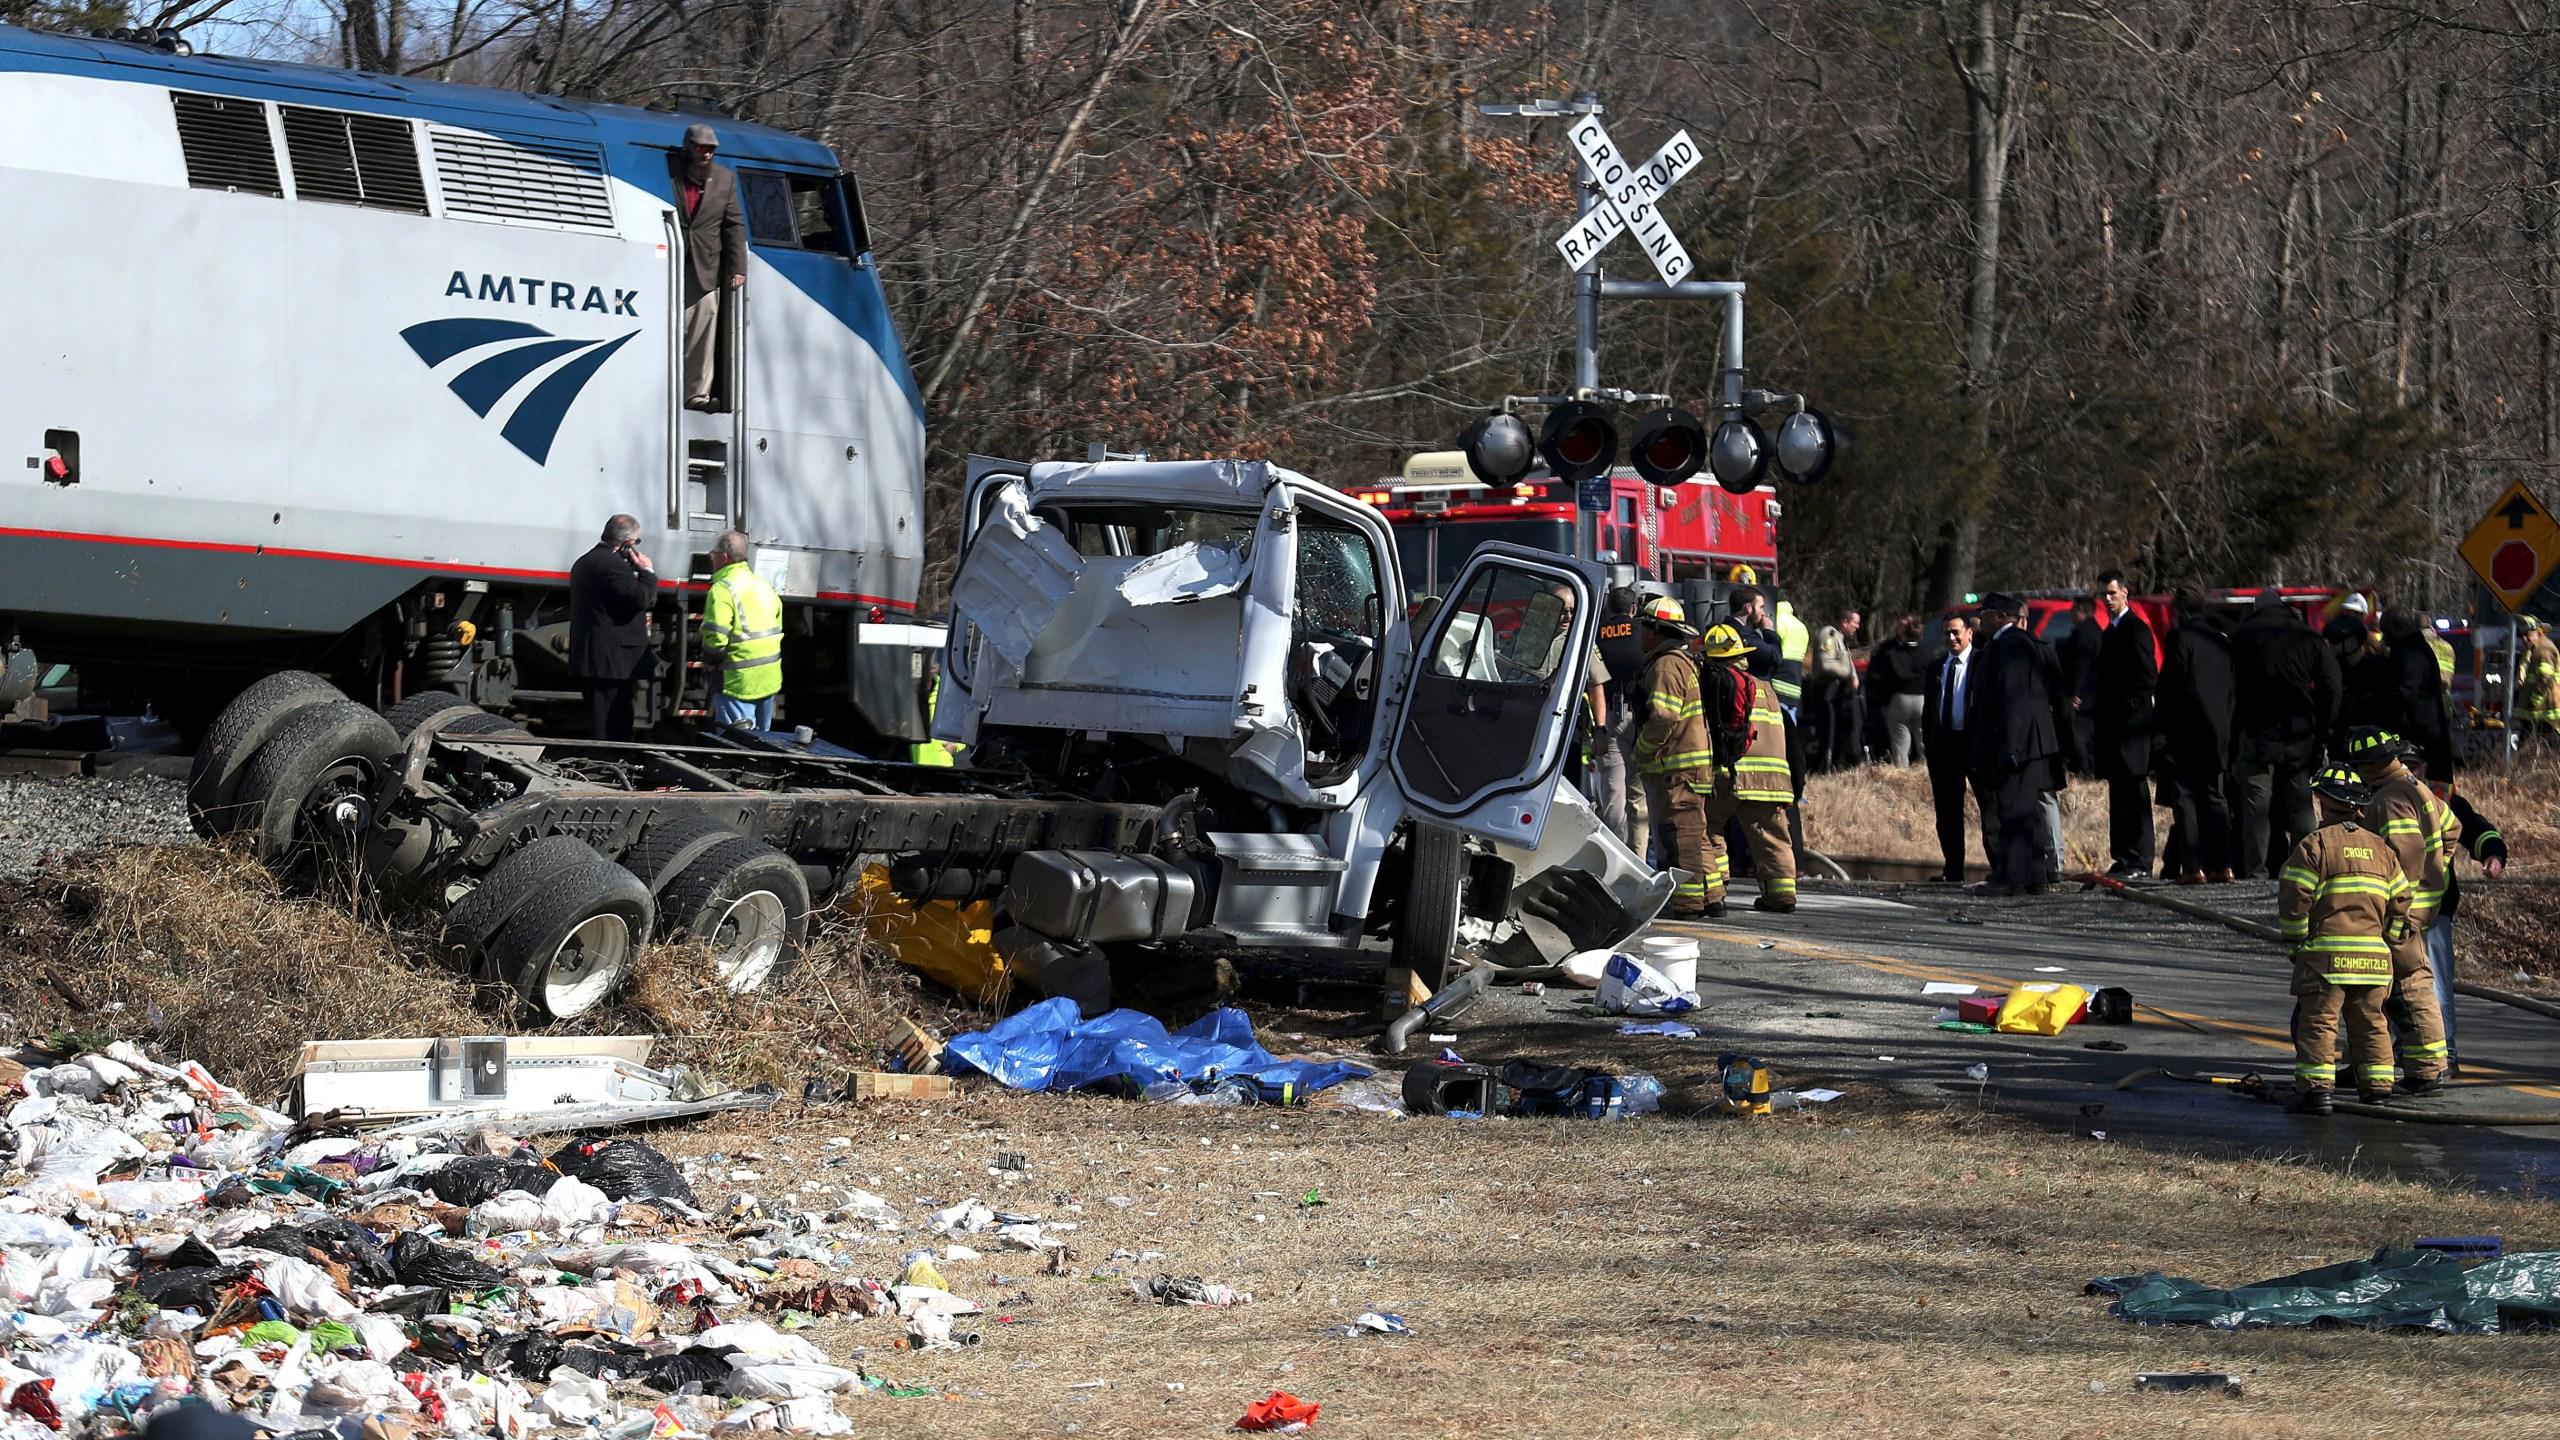 GOP lawmakers put medical skills to work after train crash